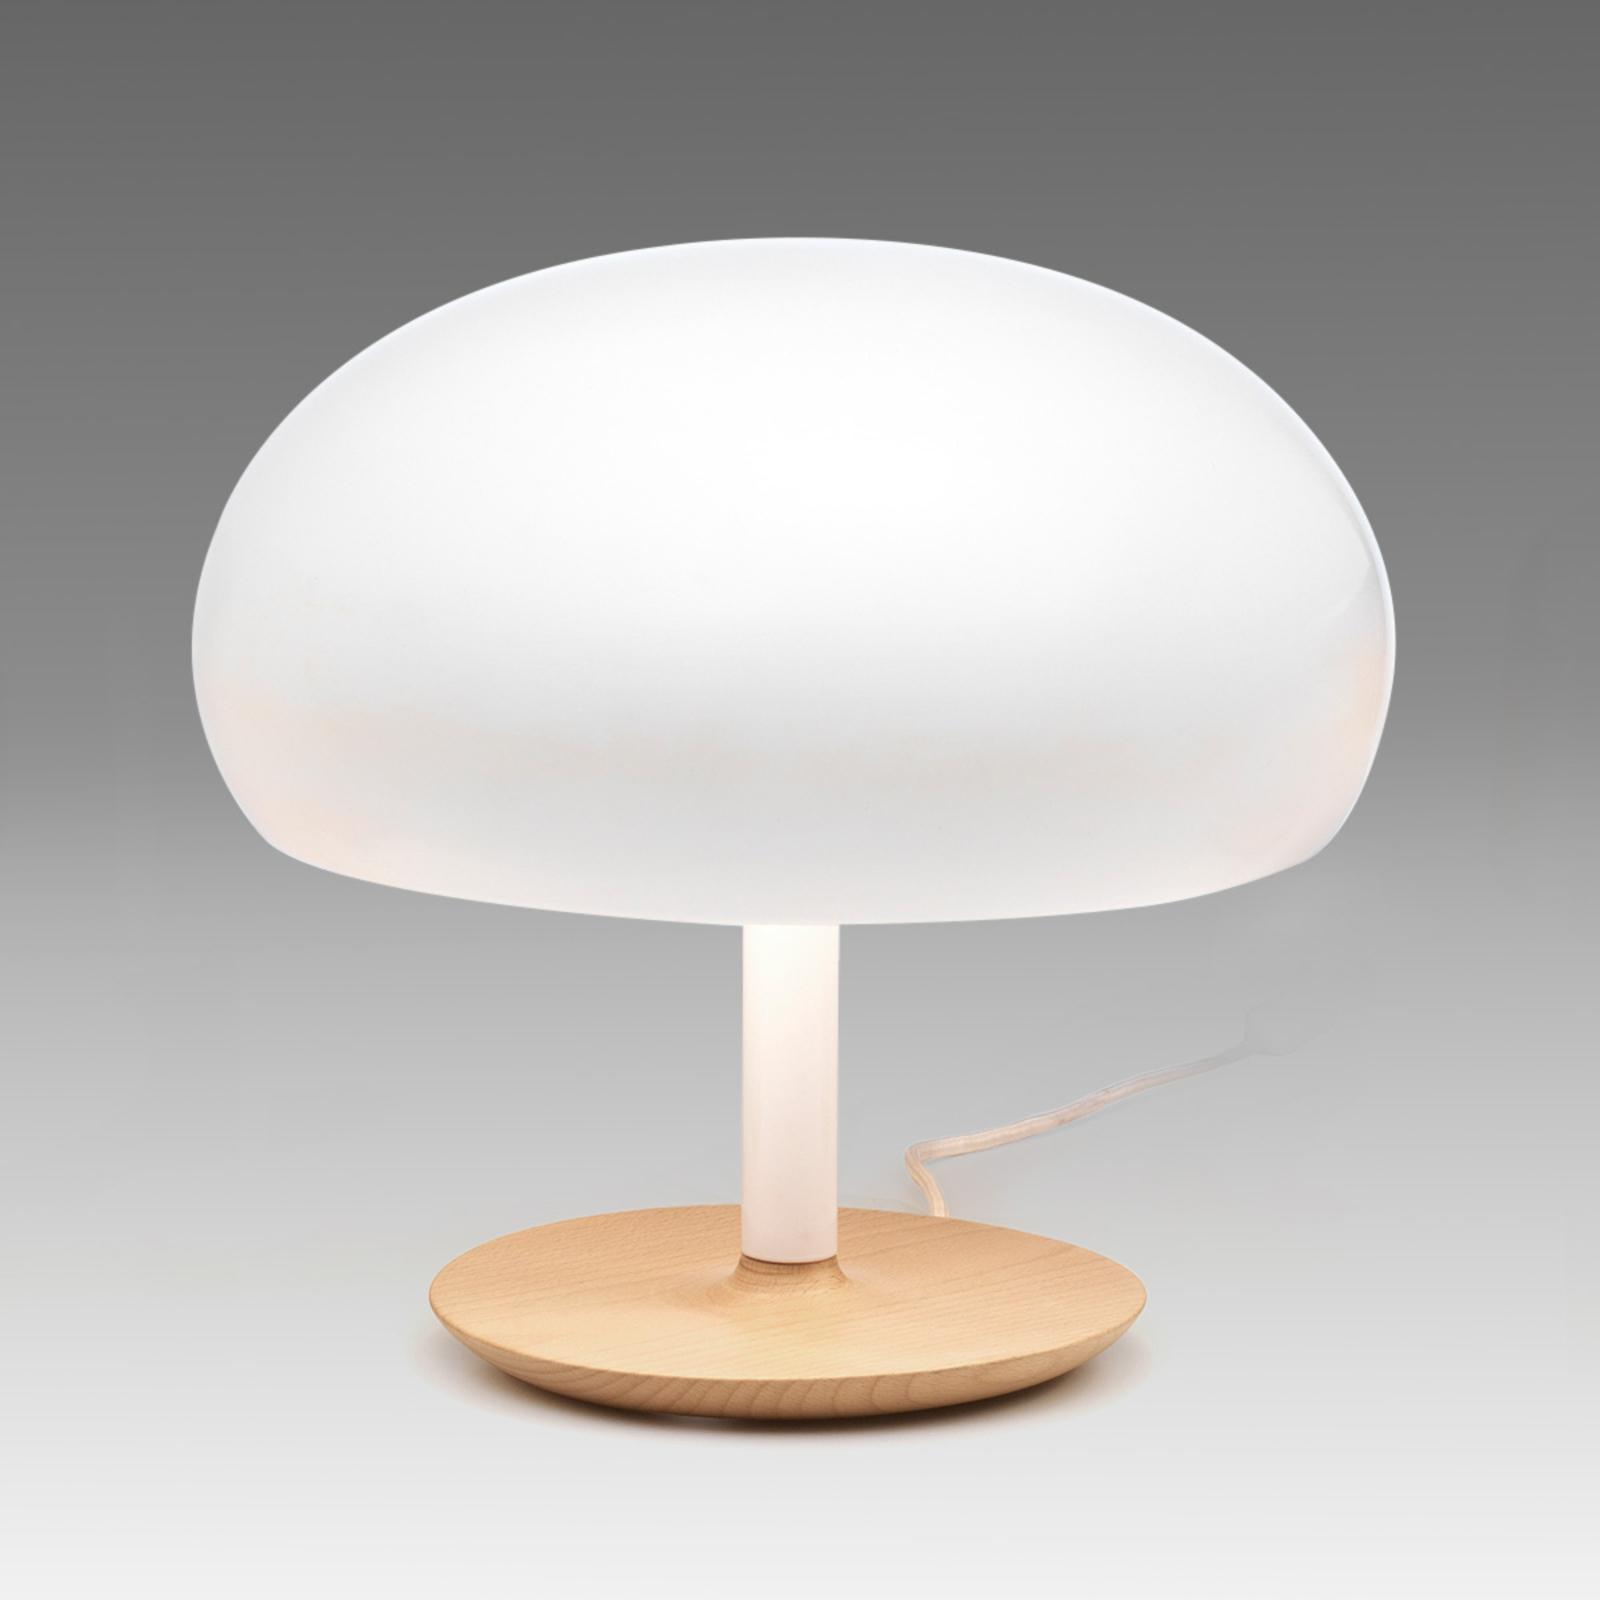 Keramik-Tischleuchte Aspen in Pilzform, 35 cm